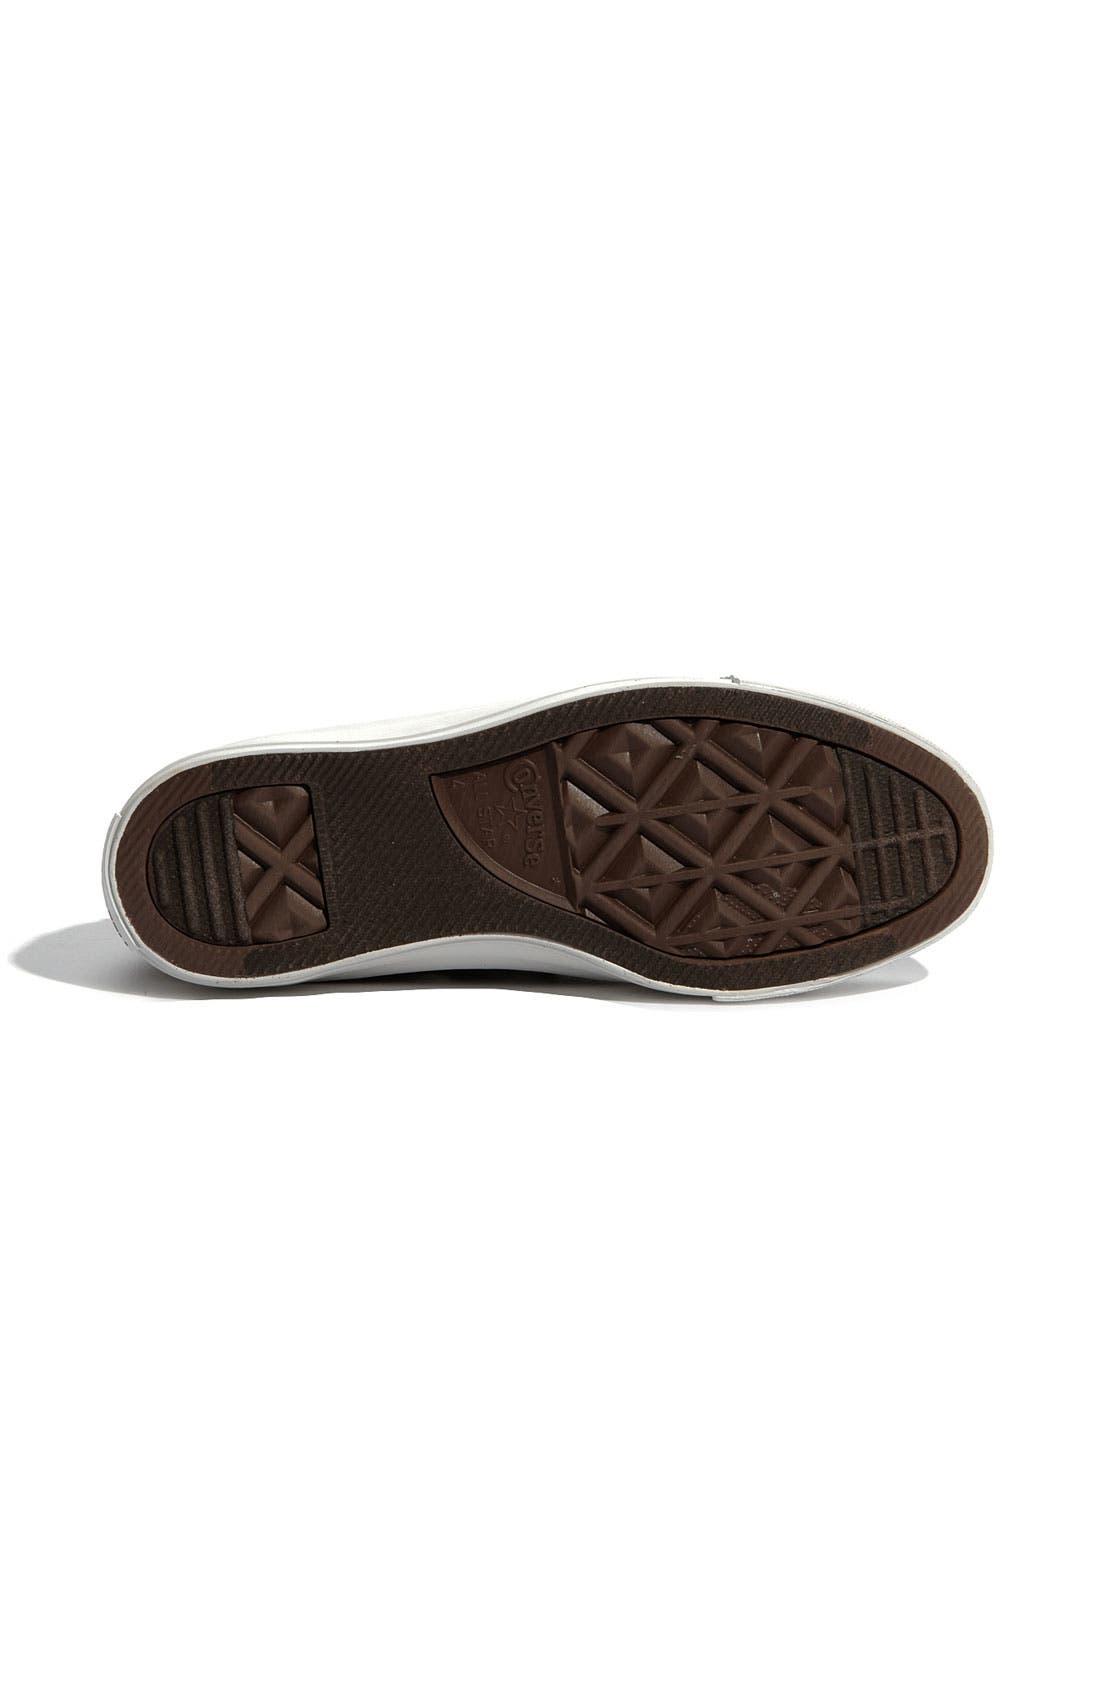 Chuck Taylor<sup>®</sup> 'Winter Glitz' Sneaker,                             Alternate thumbnail 3, color,                             001